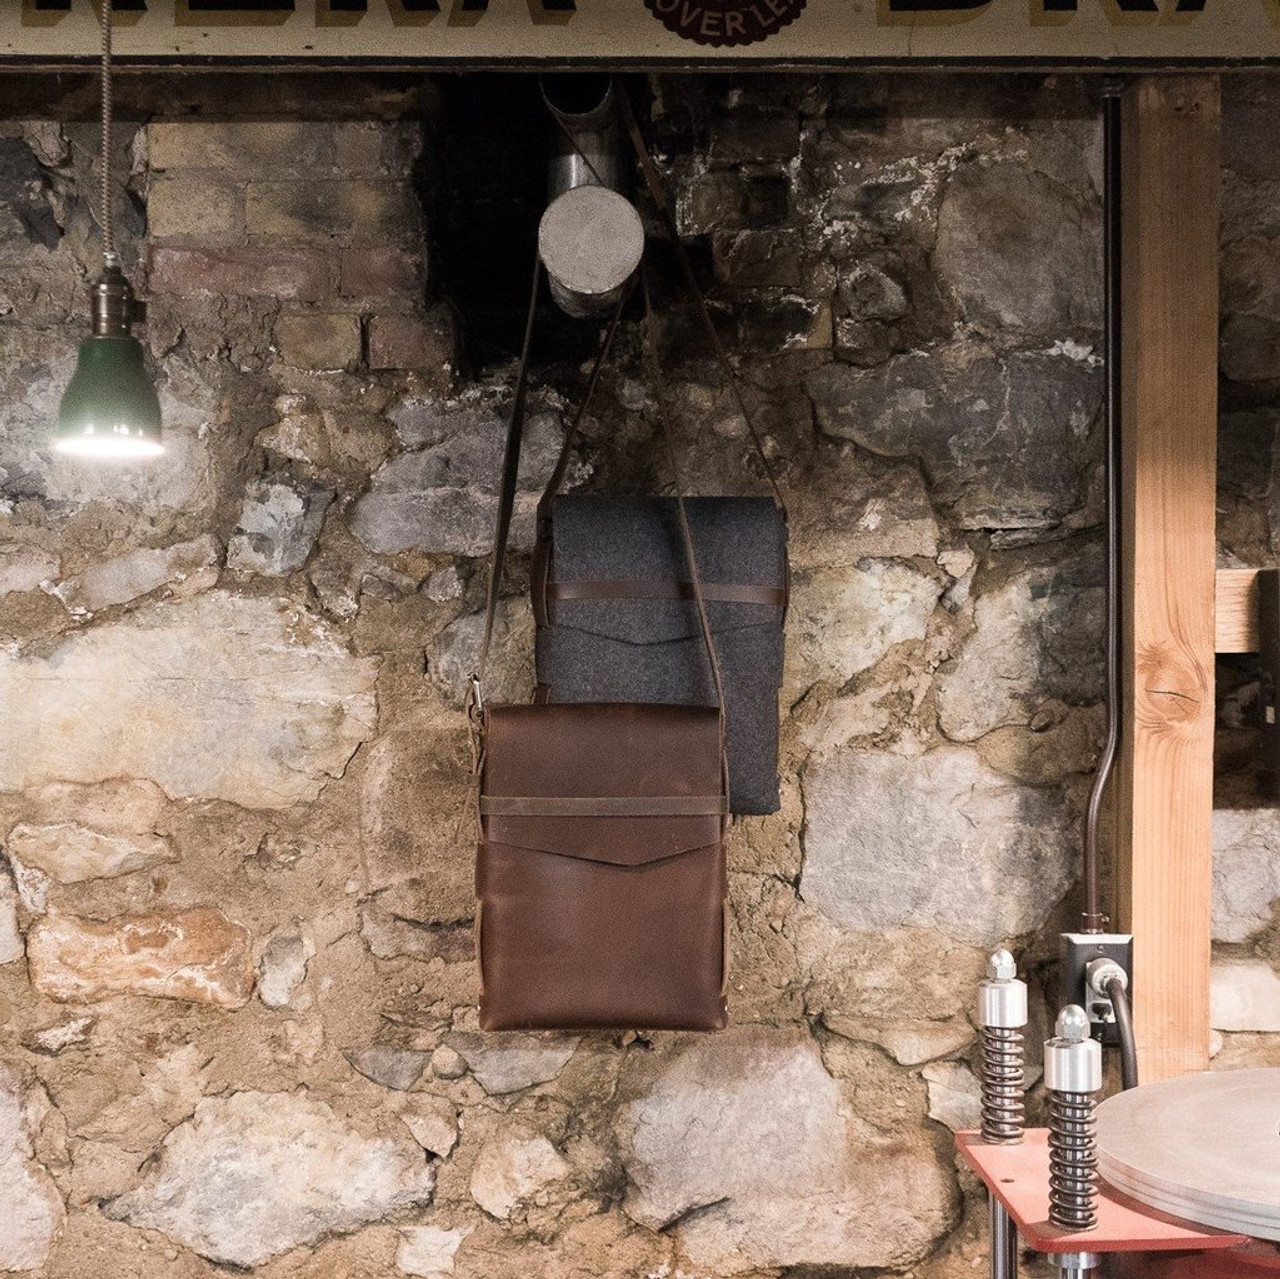 Leather Satchel - Explorer by Rustico - Dark Brown - Lifestyle 2